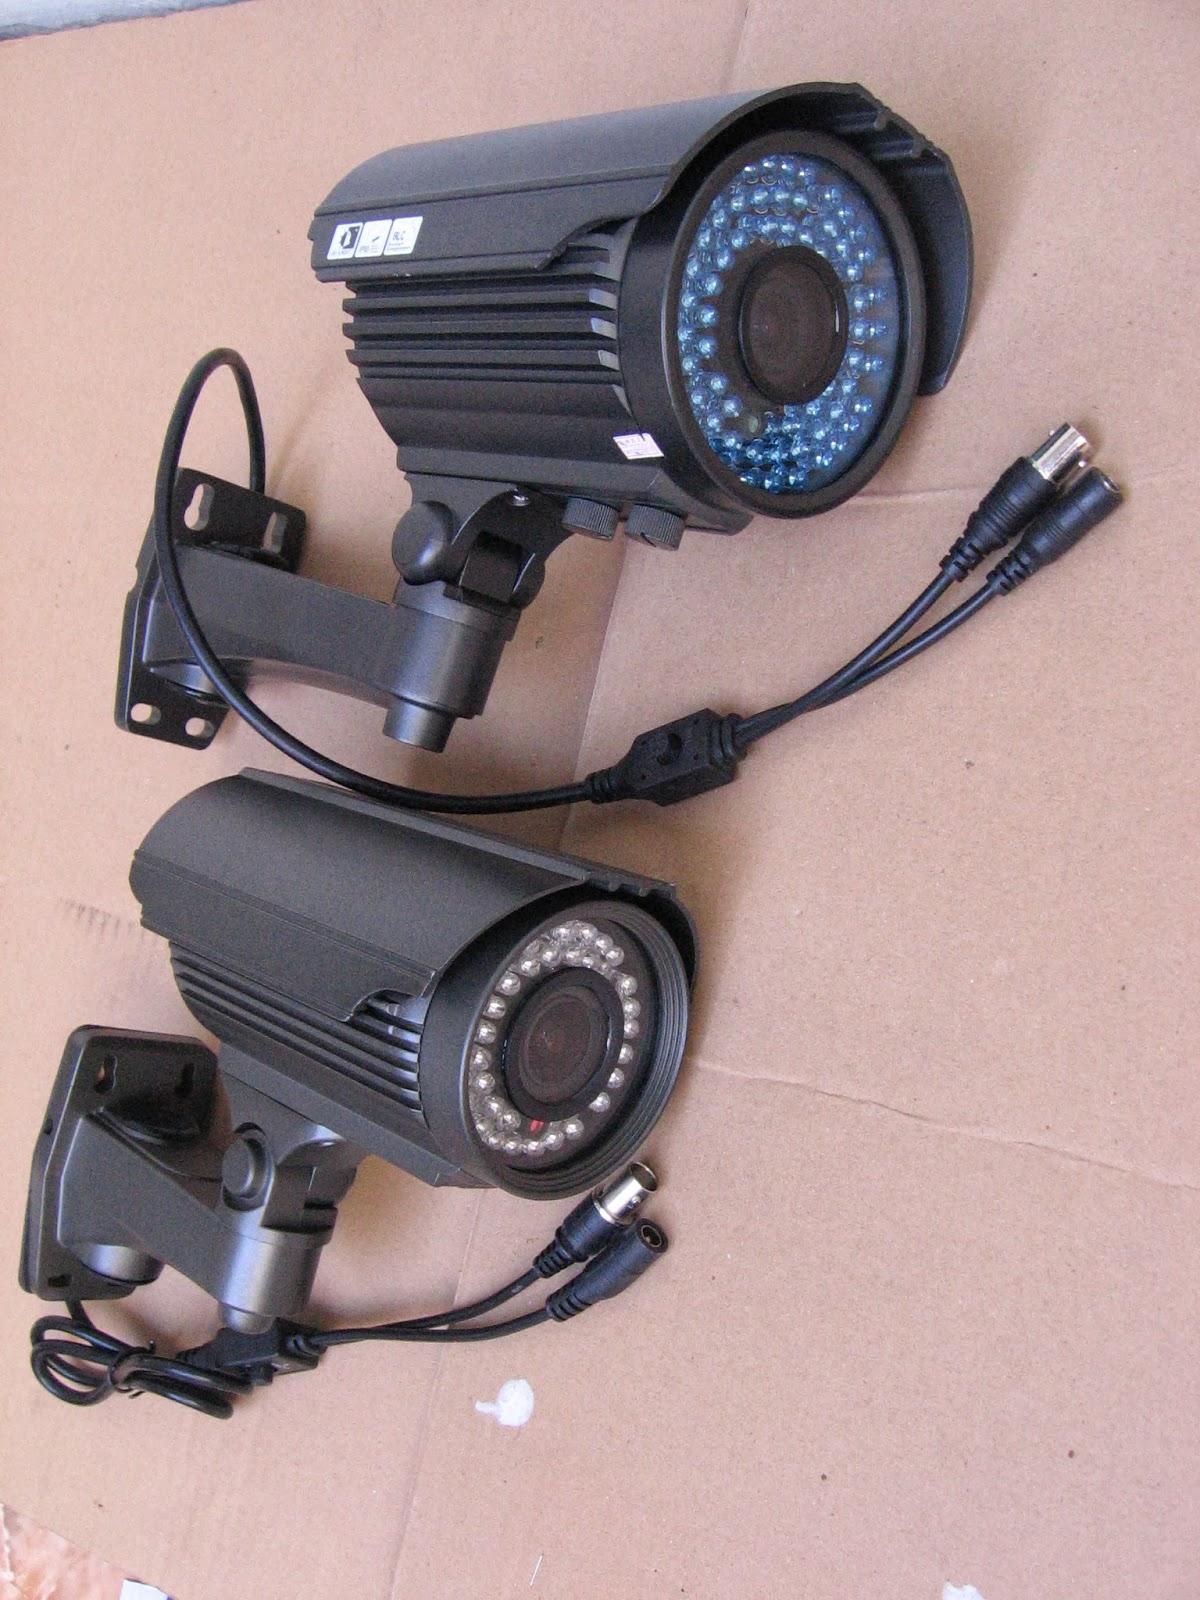 KAMERA CCTV OUTDOOR 1/3 SONY EFFIO-E 700 TVL | DAFTAR